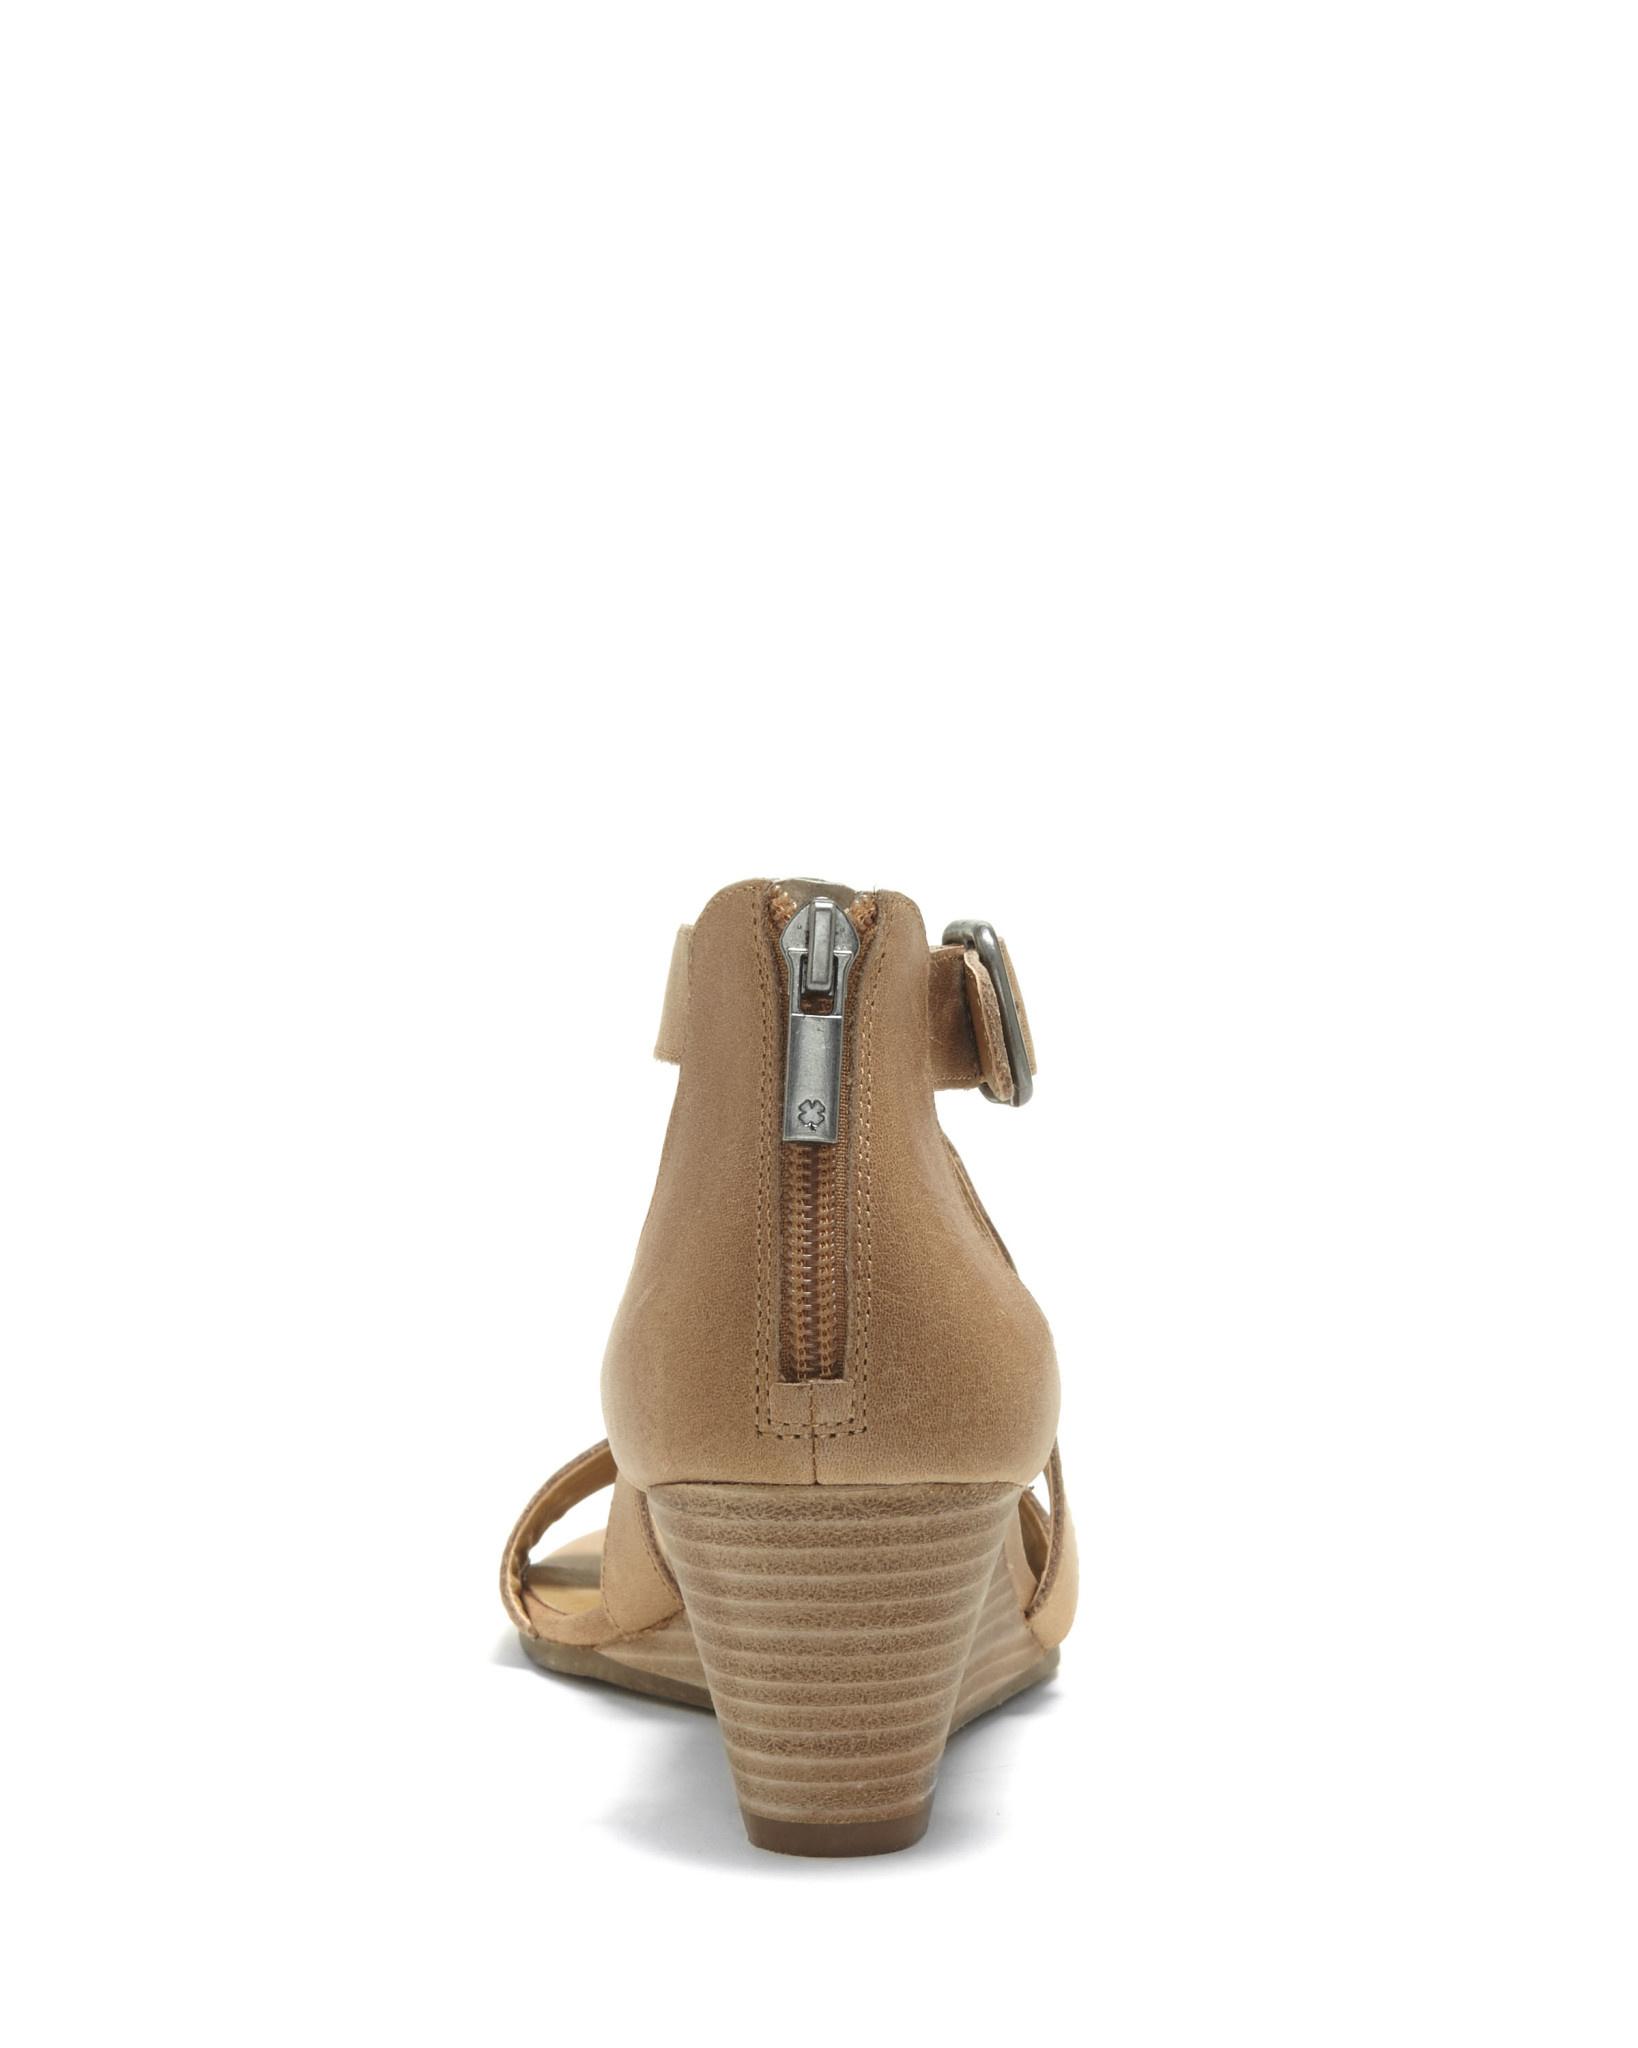 Jenley Sandal Dark Camel